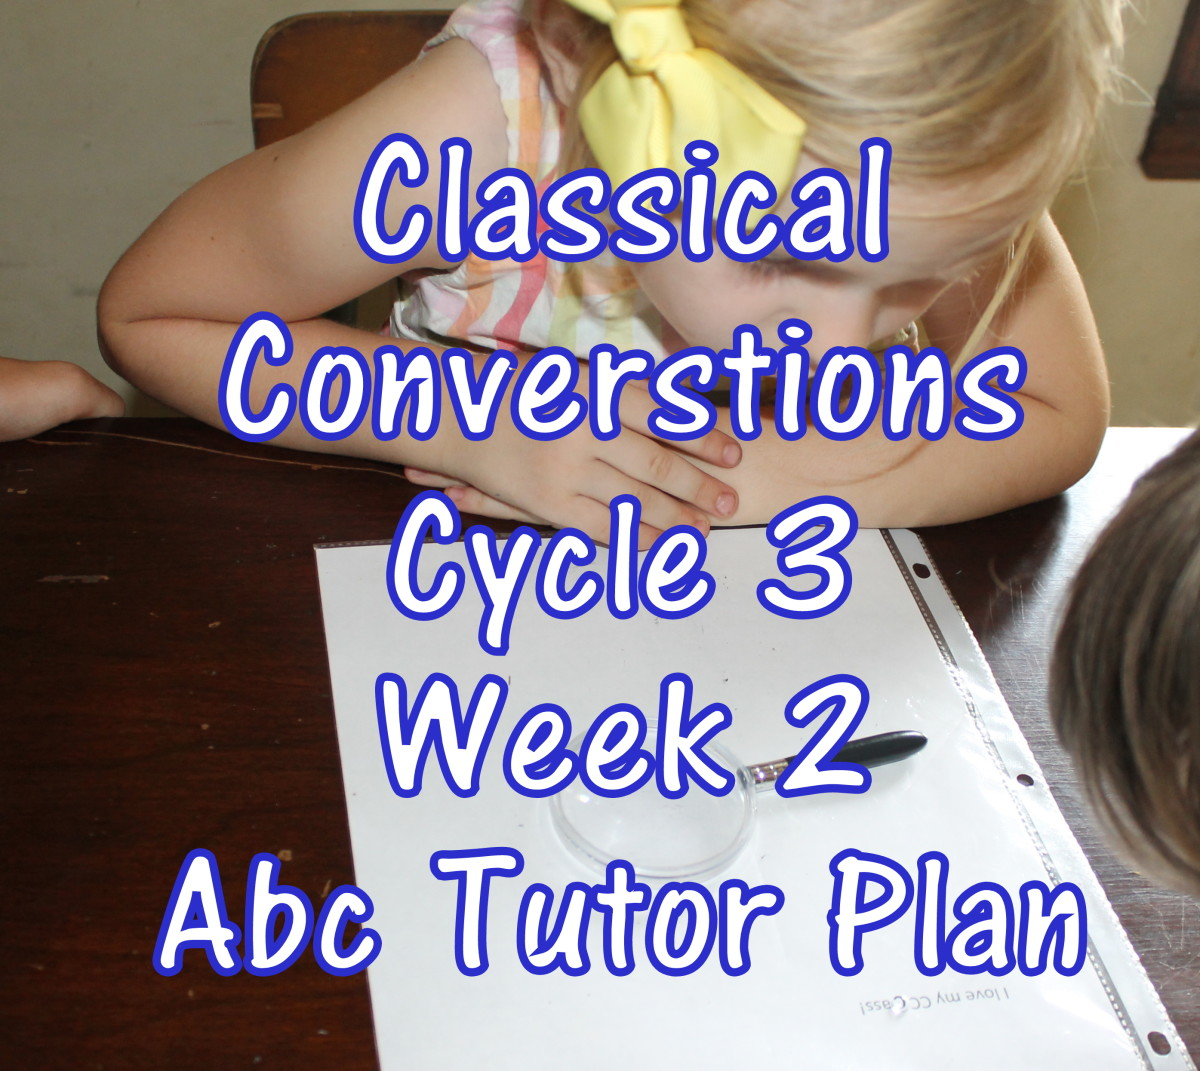 Cc Cycle 3 Week 2 Lesson For Abecedarian Tutors